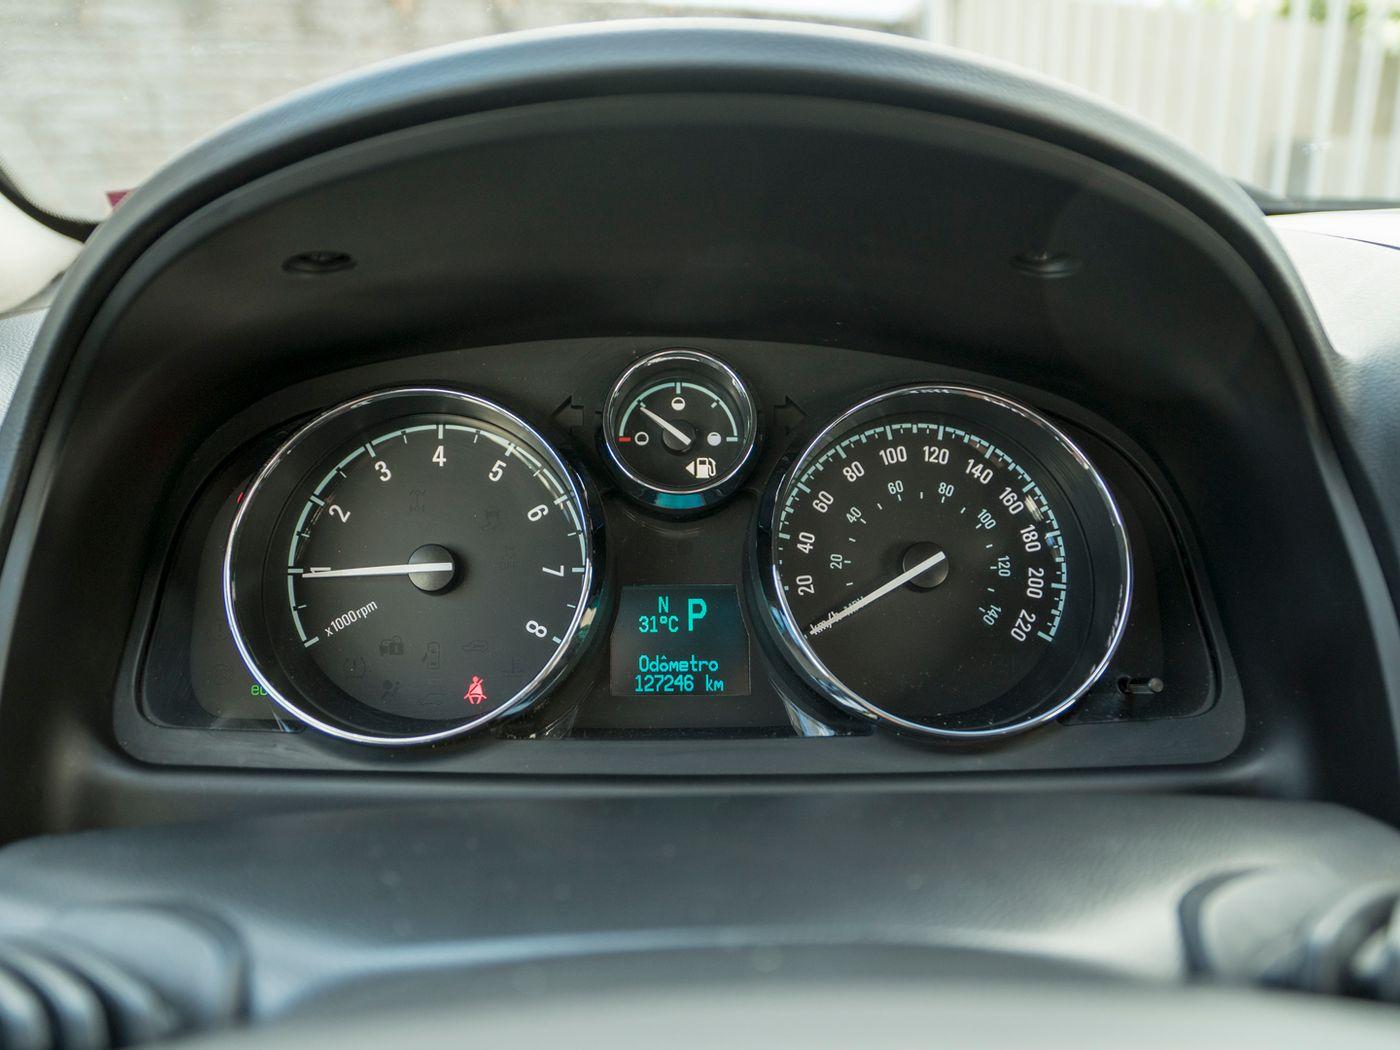 Chevrolet CAPTIVA SPORT FWD 2.4 16V 171/185cv